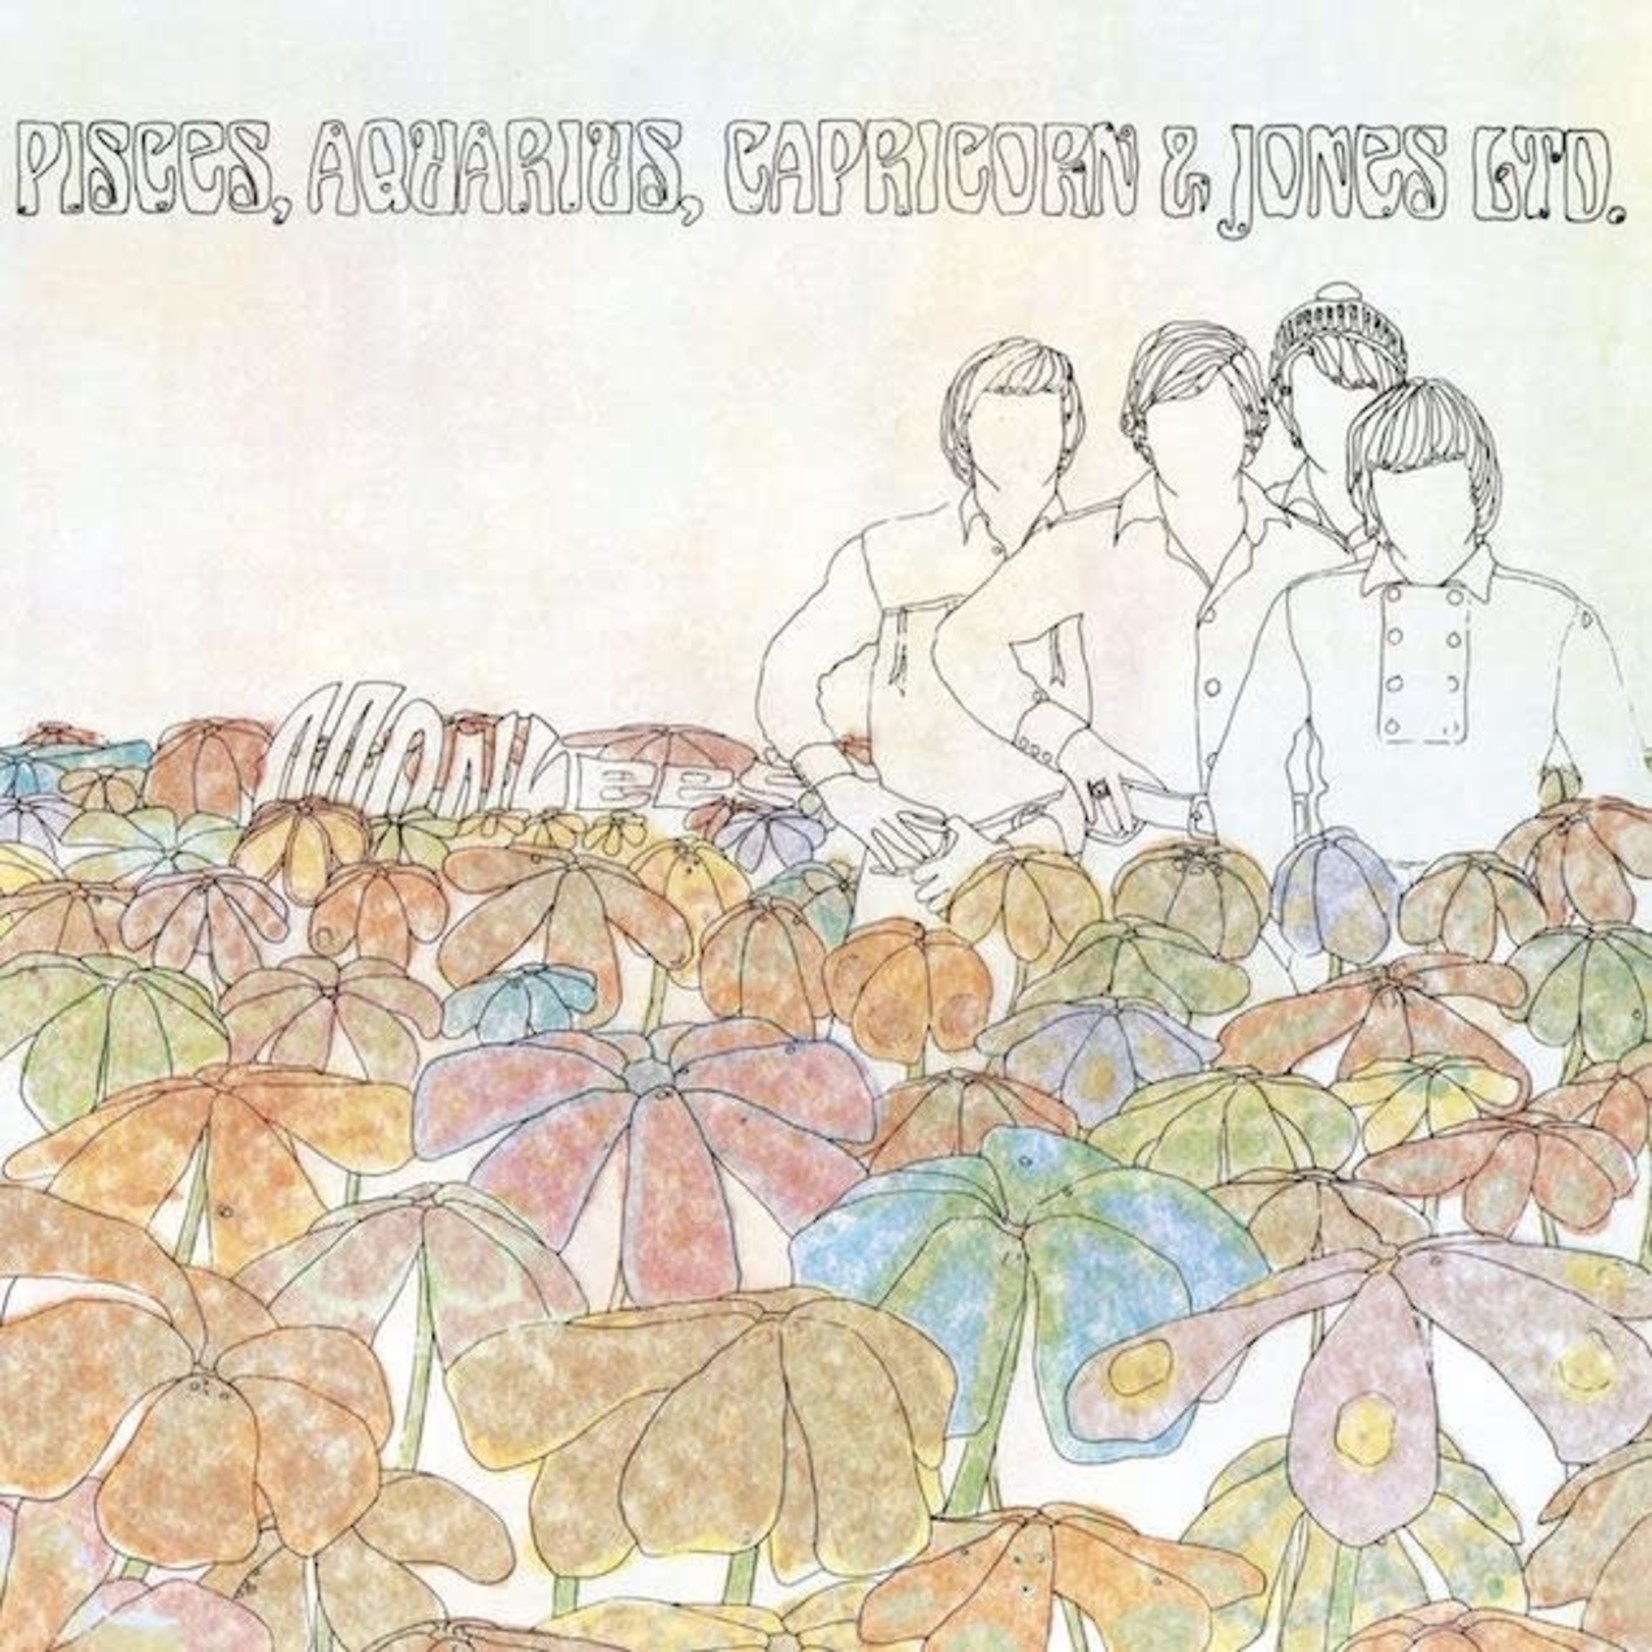 [Vintage] Monkees: Pisces, Aquarius, Capricorn & Jones Ltd.